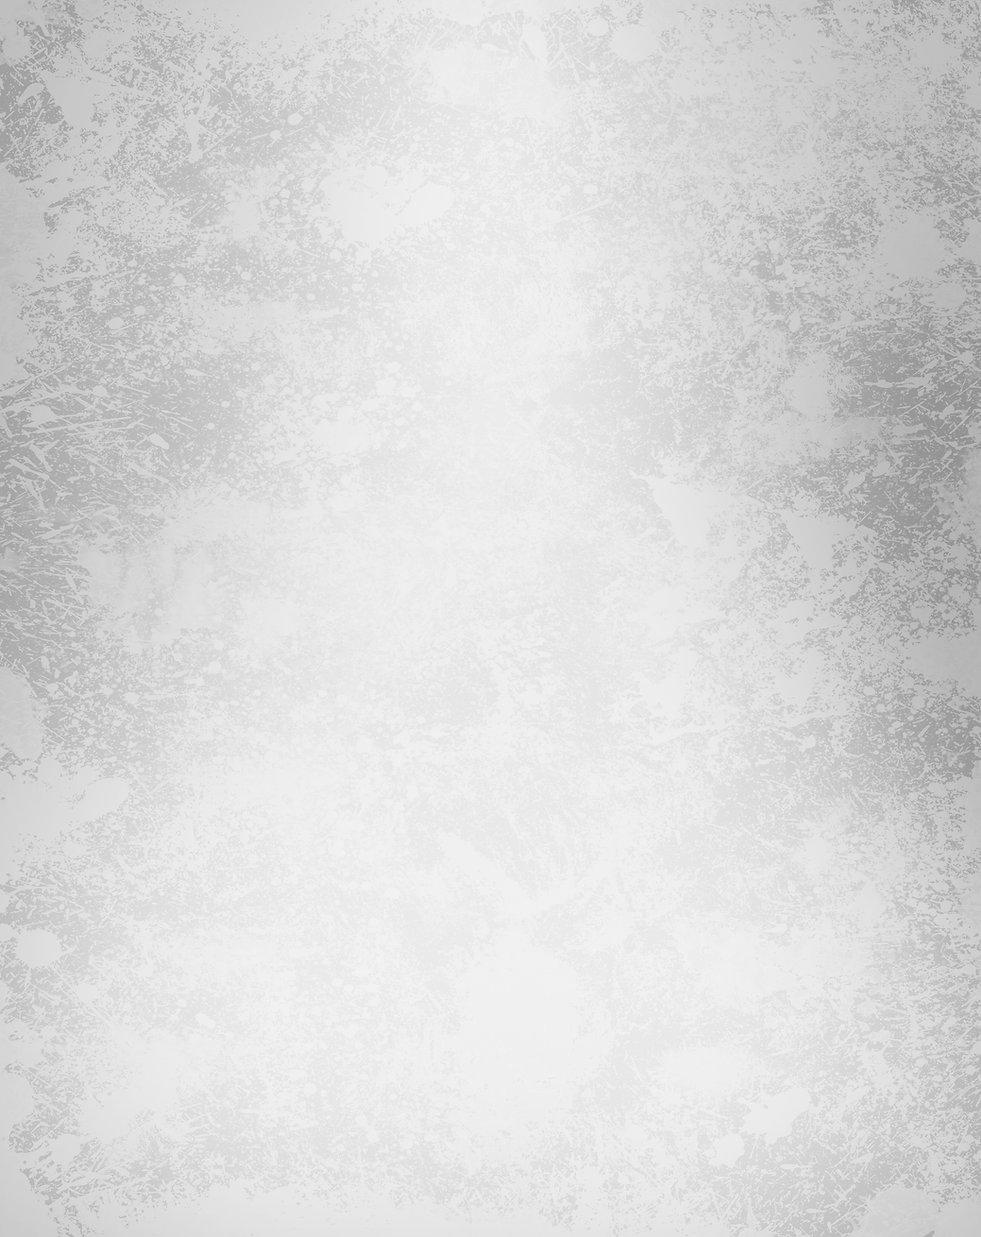 website backgroud white.jpeg